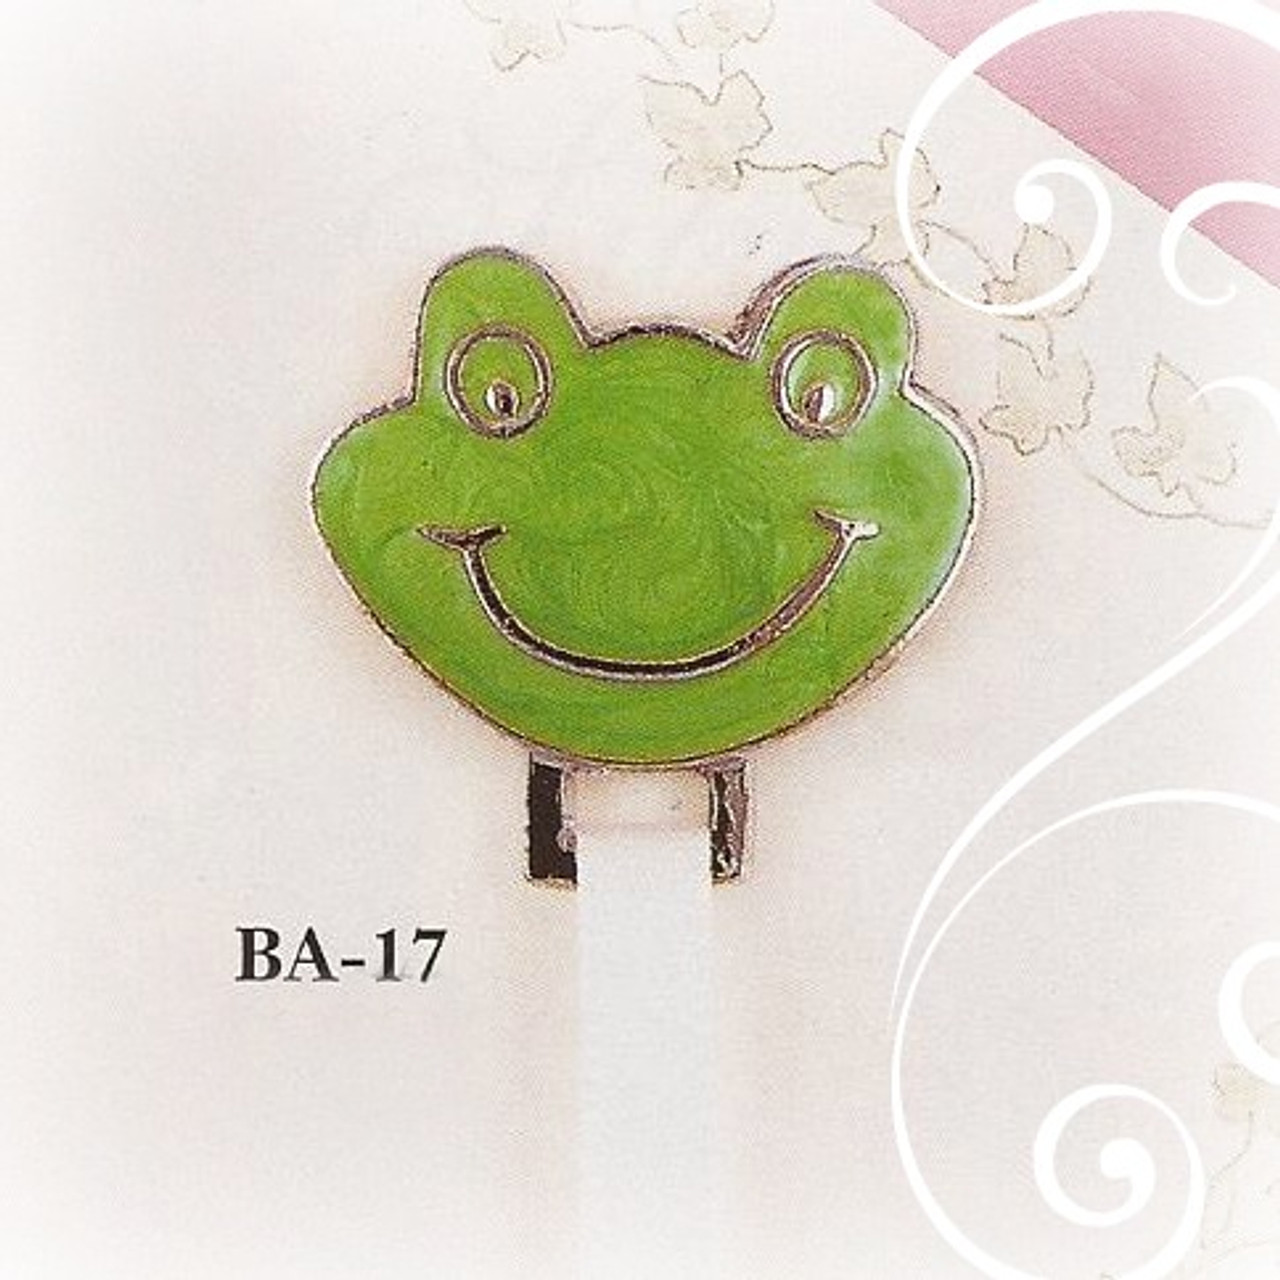 BA-17 Froggie Paci Holder